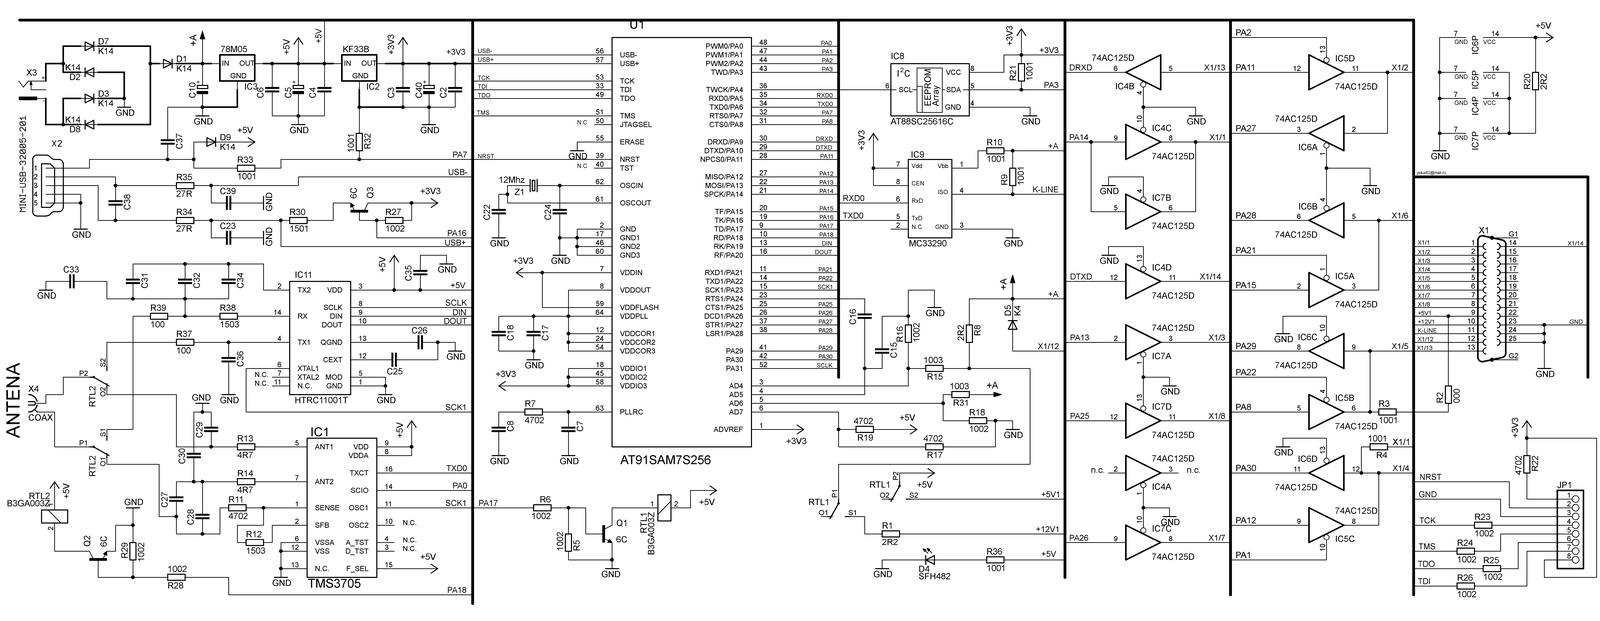 carprog-clone-schematic-diagram